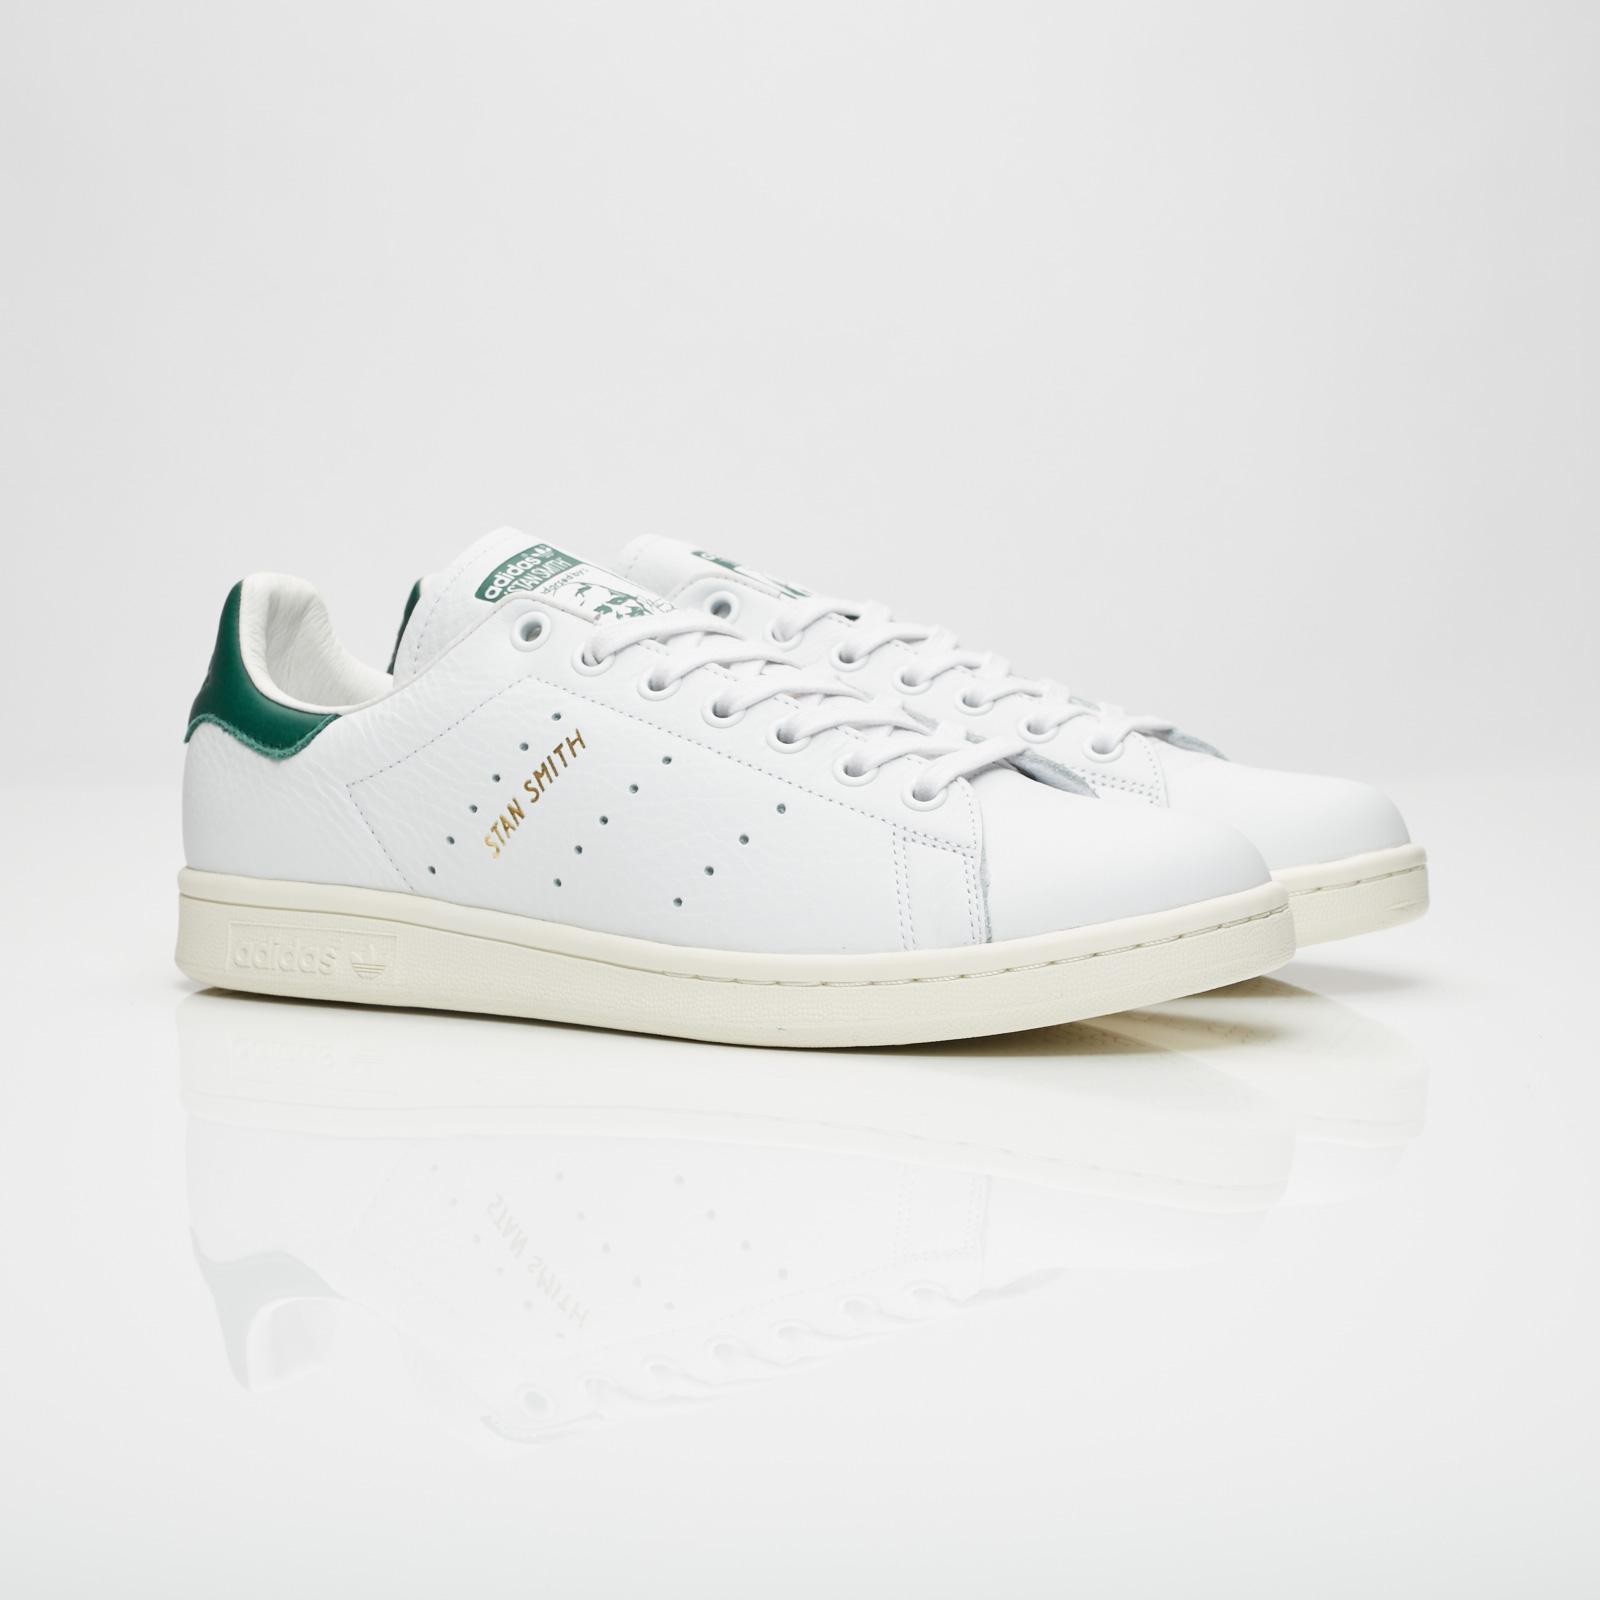 Adidas Stan Smith Scarpe Cq2871 Scarpe da Ginnasticanstuff Scarpe Smith & Streetwear 0ba833